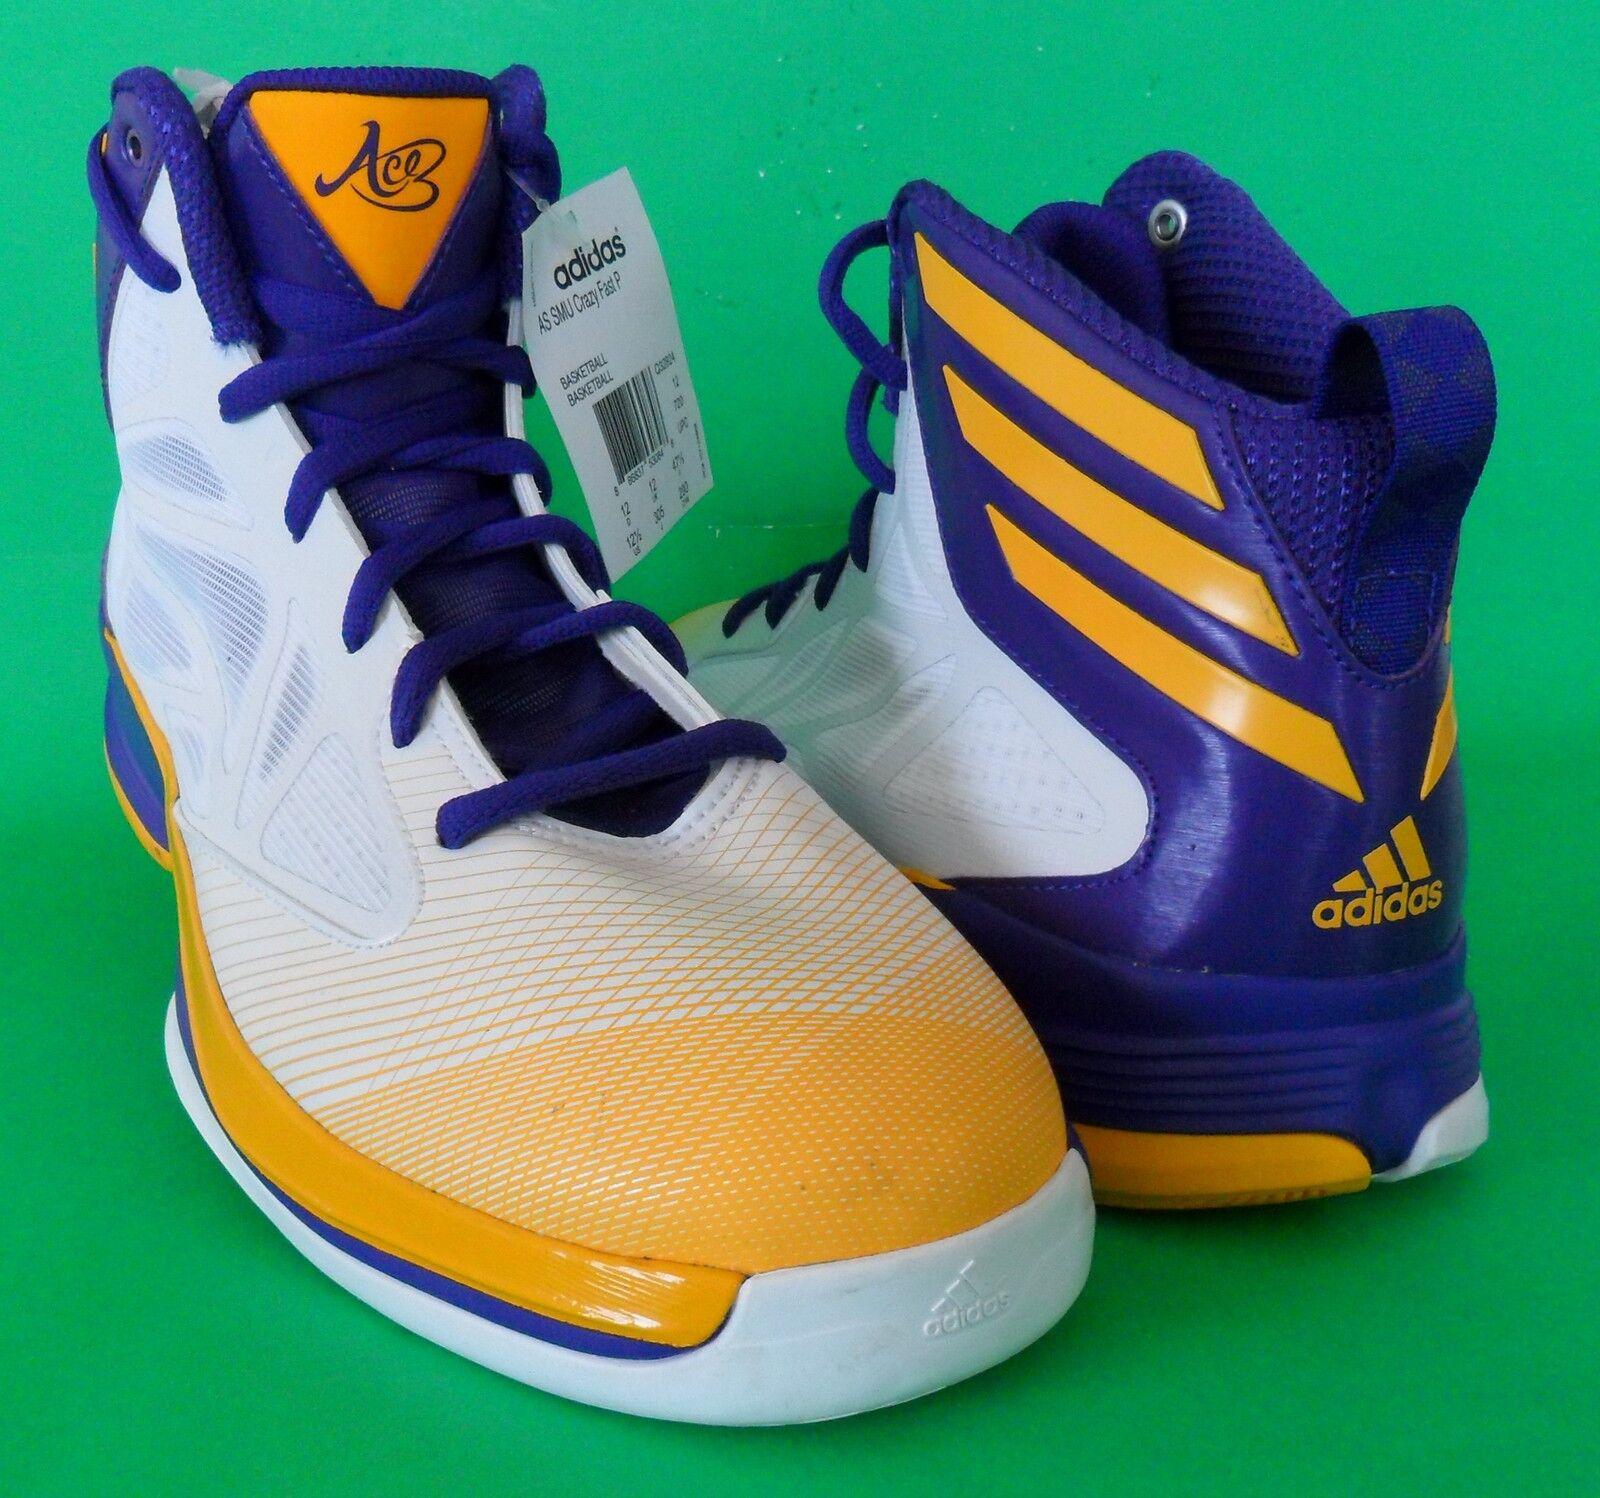 LTD EDAdidas CRAZY FAST ACE3 Candace Parker Basketball qucik light shoesSz 12.5